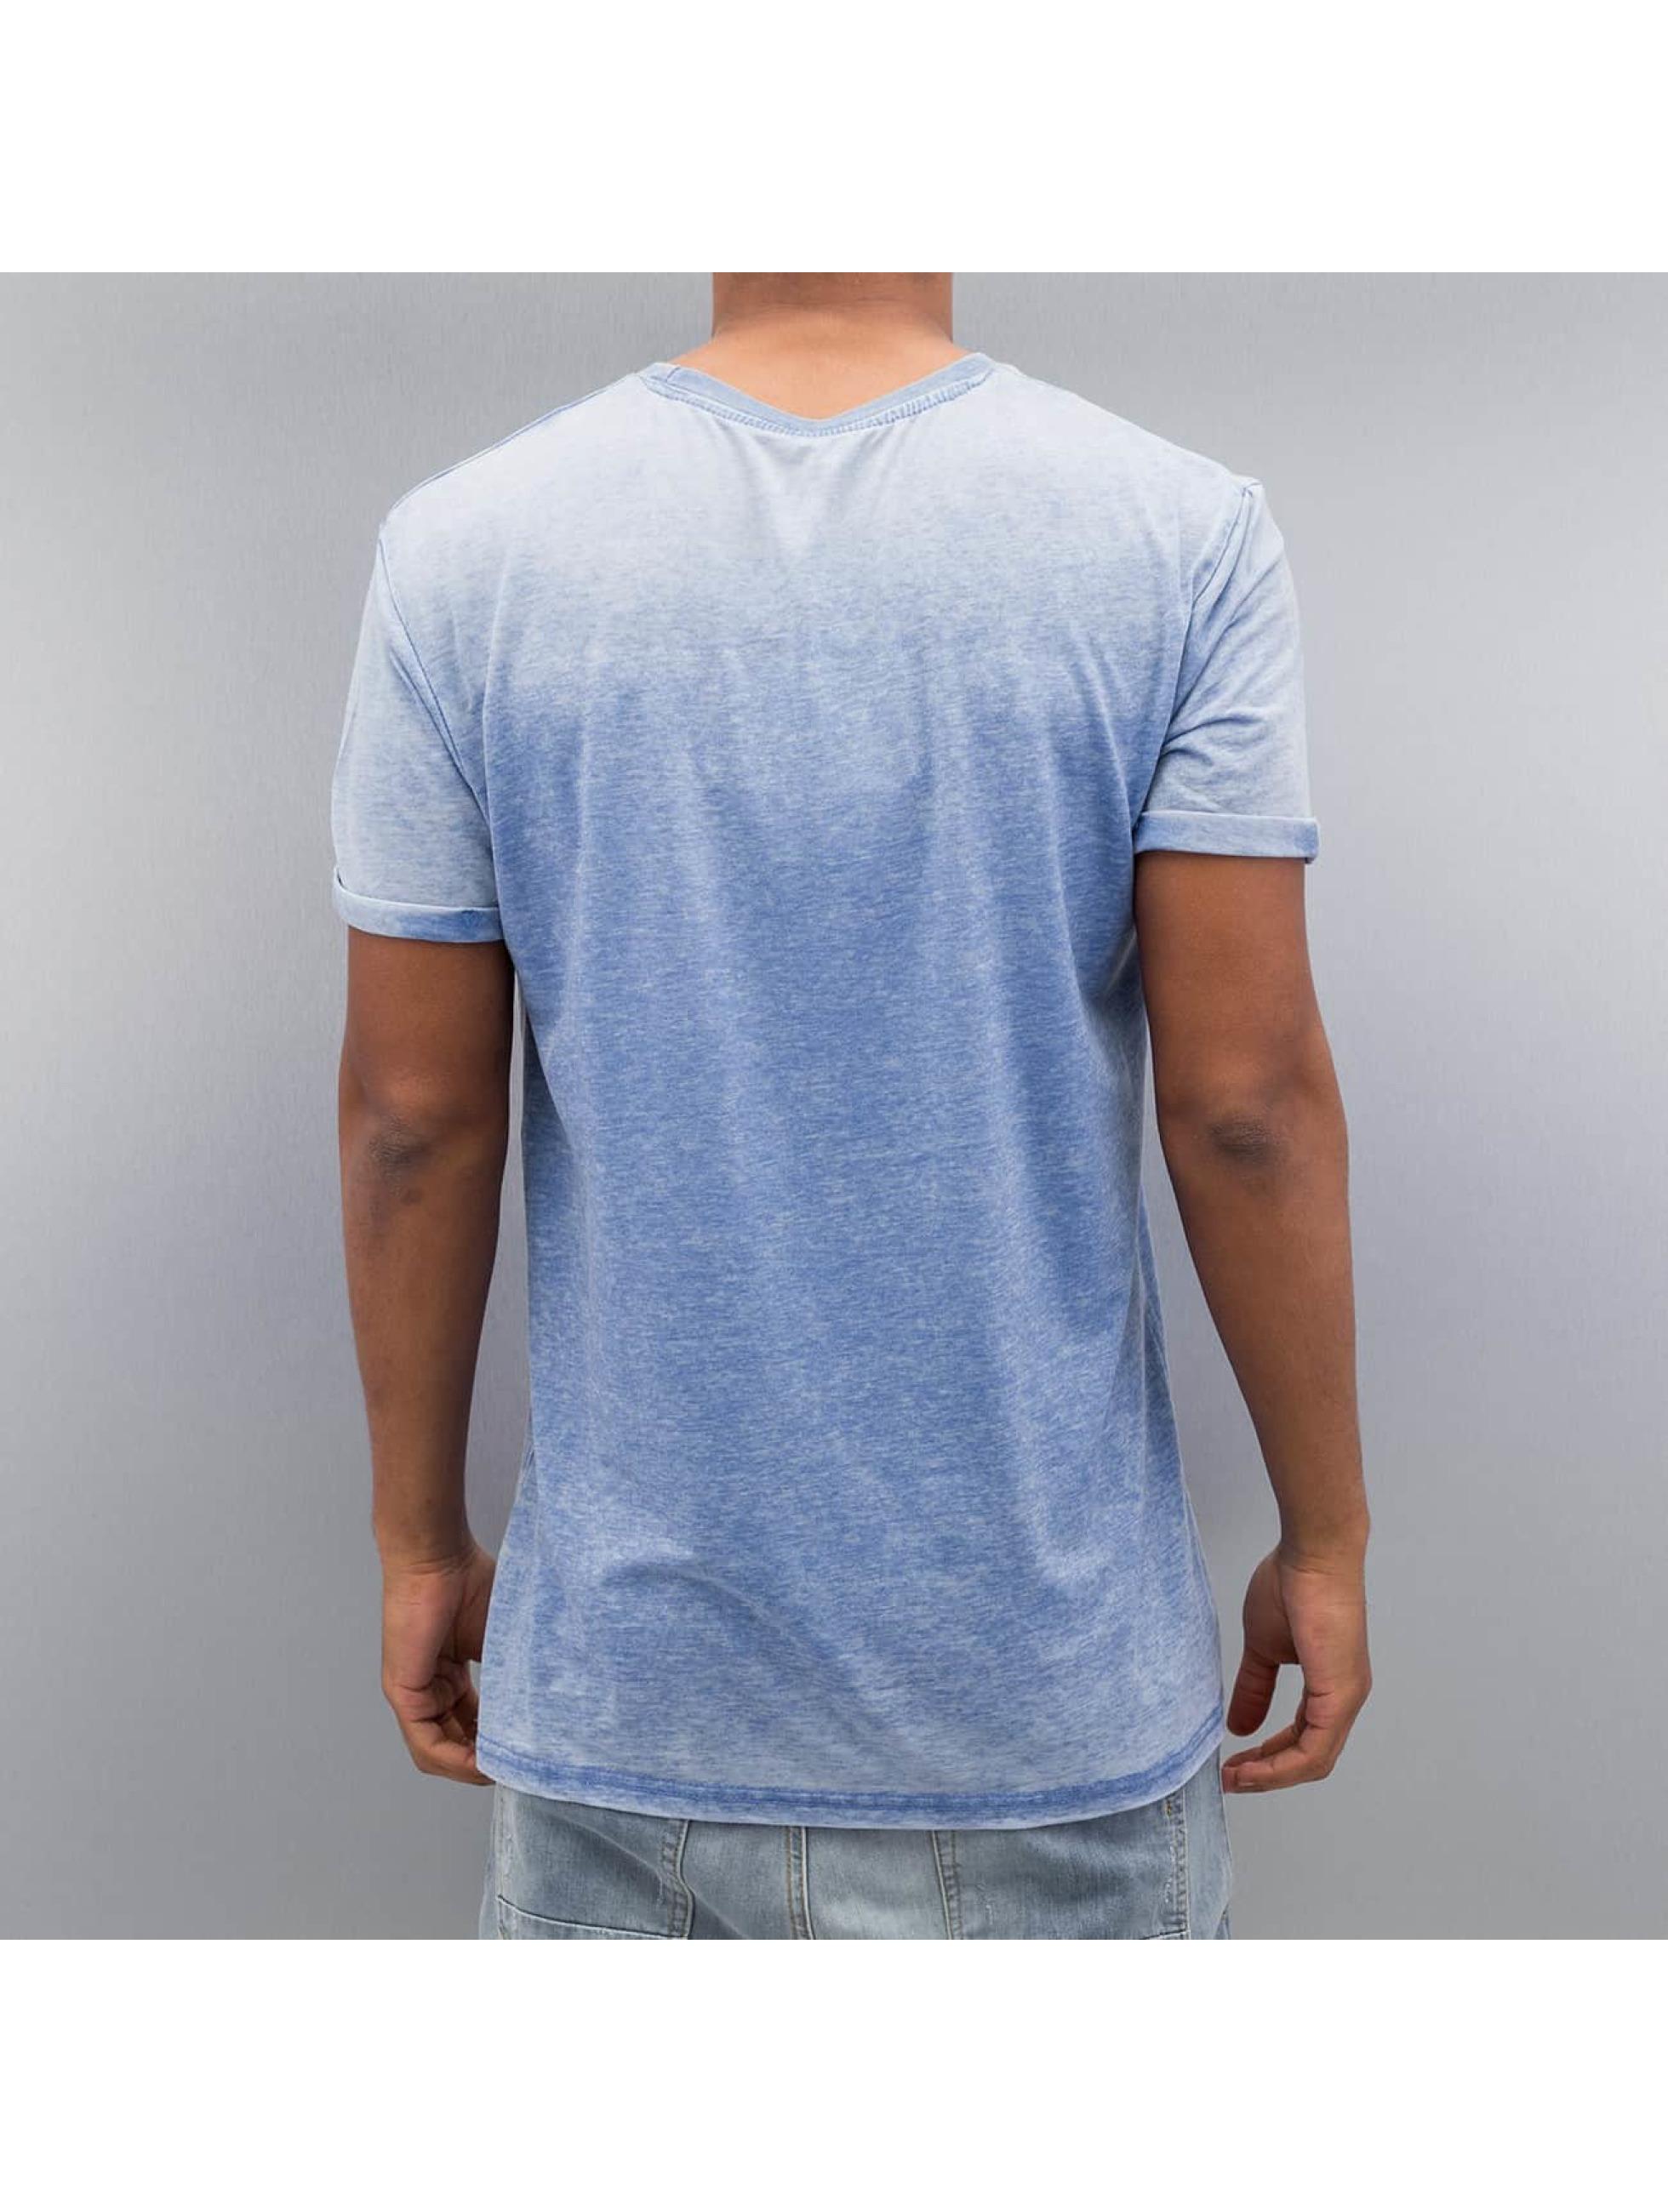 Monkey Business T-Shirt Limited Edition bleu